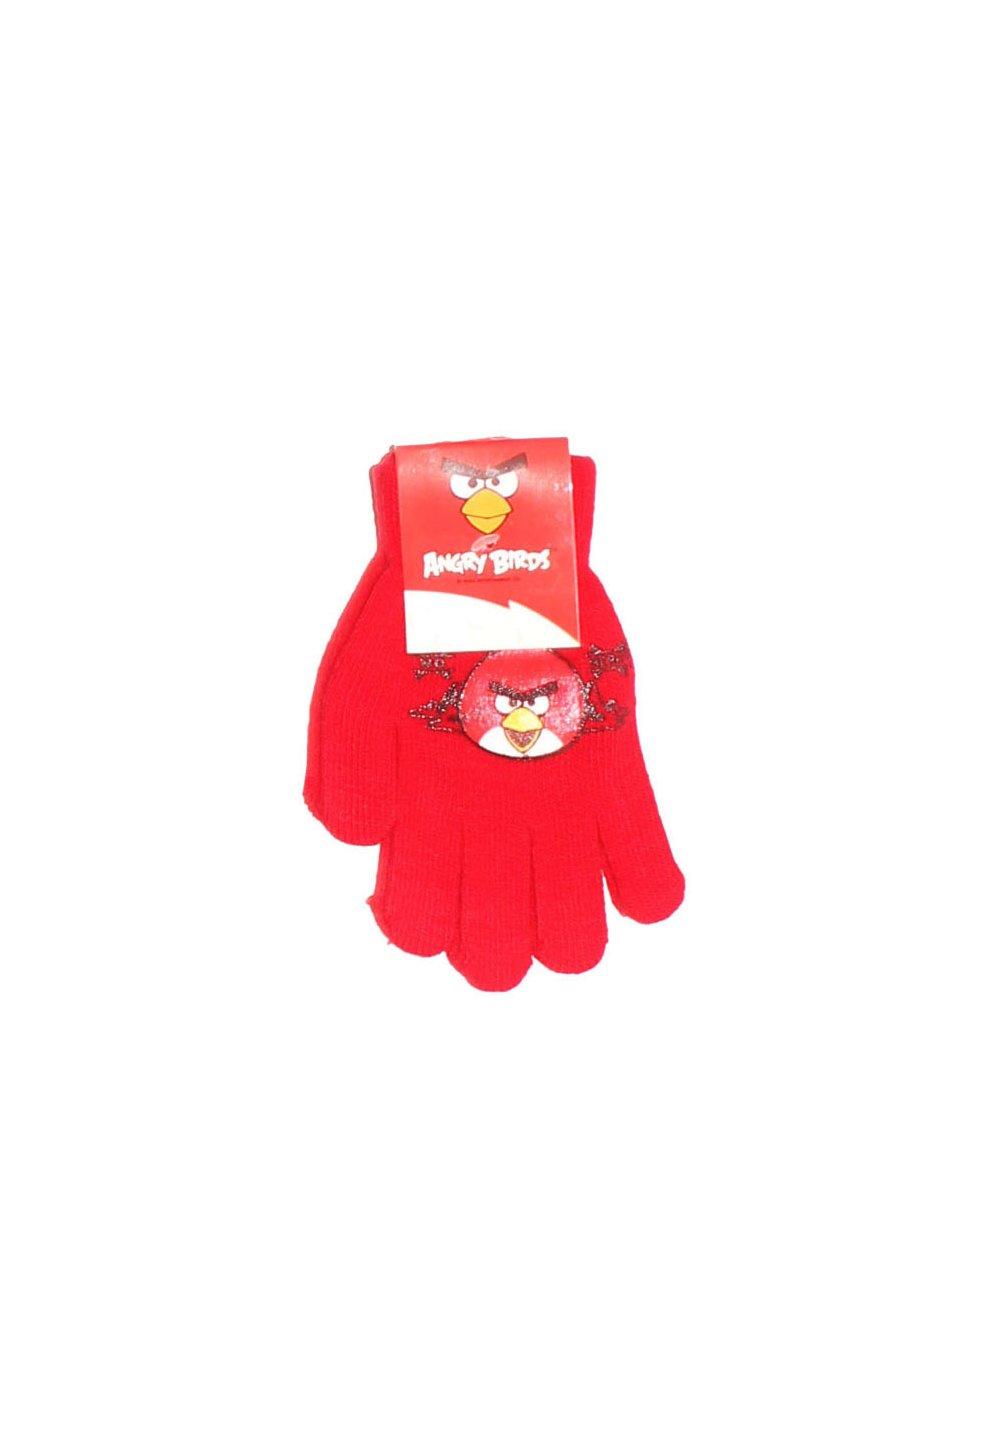 Manusi cu degete, Angry Birds, 3-7ani, rosii imagine